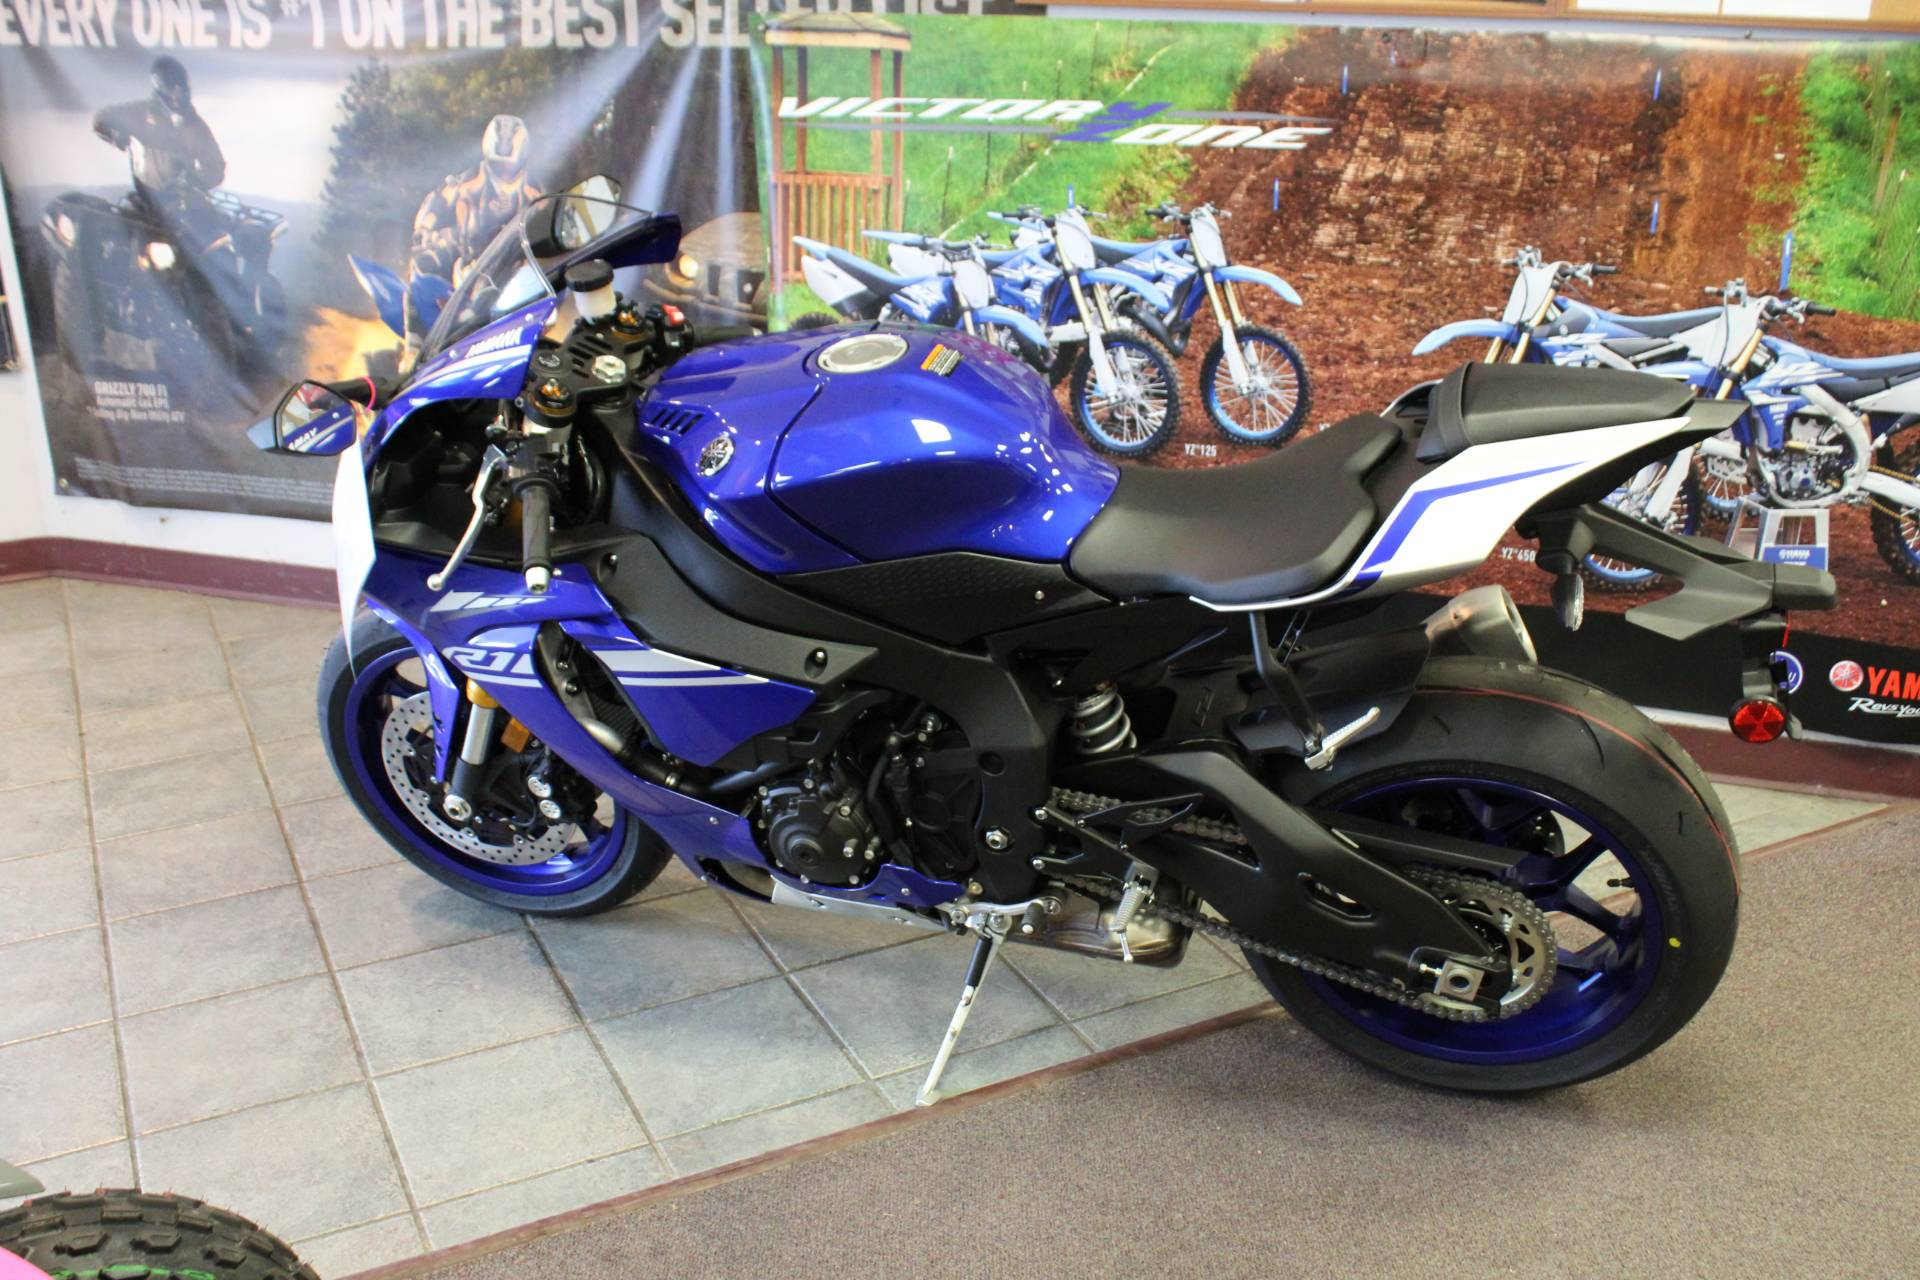 2017 yamaha yzf r1 motorcycles palatka florida na 2017 yamaha yzf r1 in palatka florida publicscrutiny Images